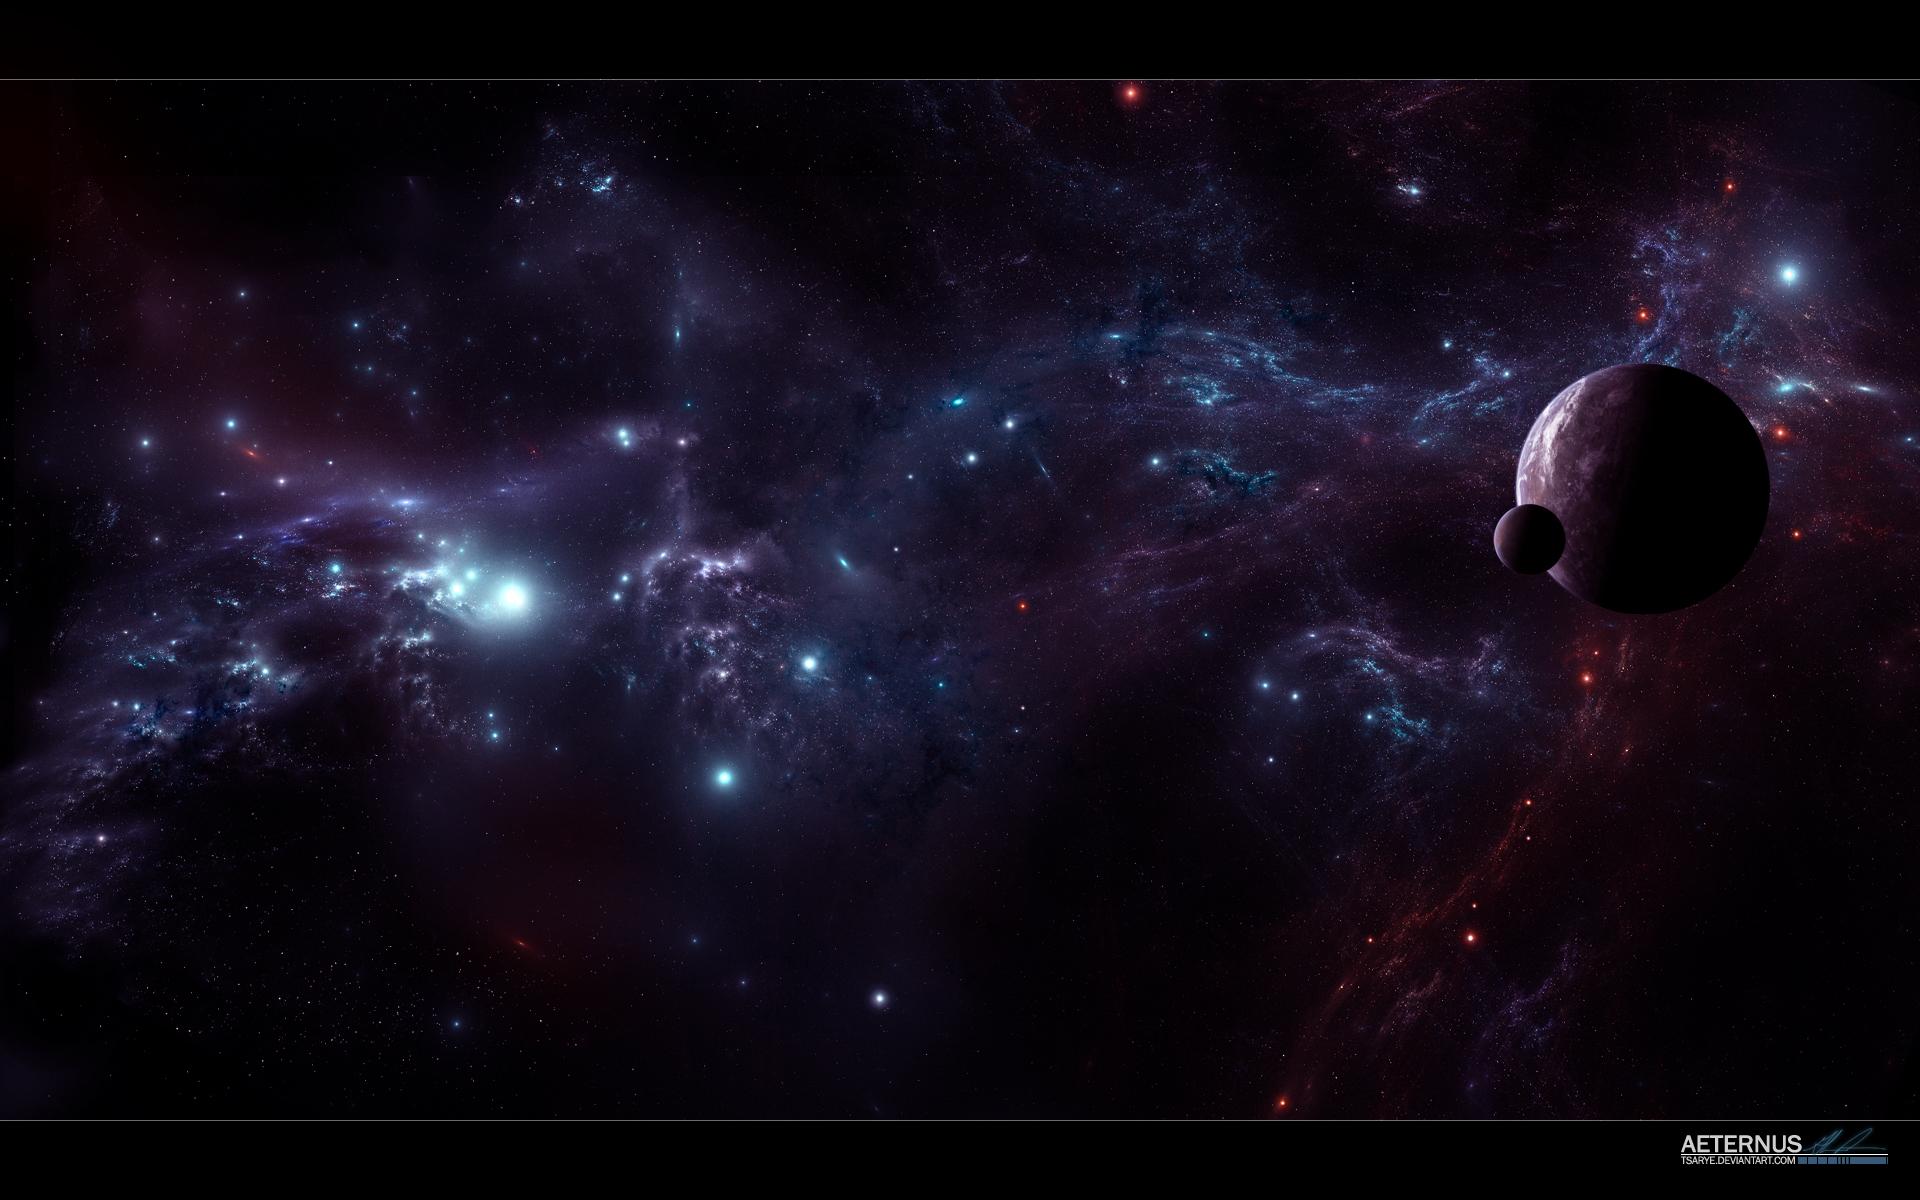 Aeternus by GlennClovis